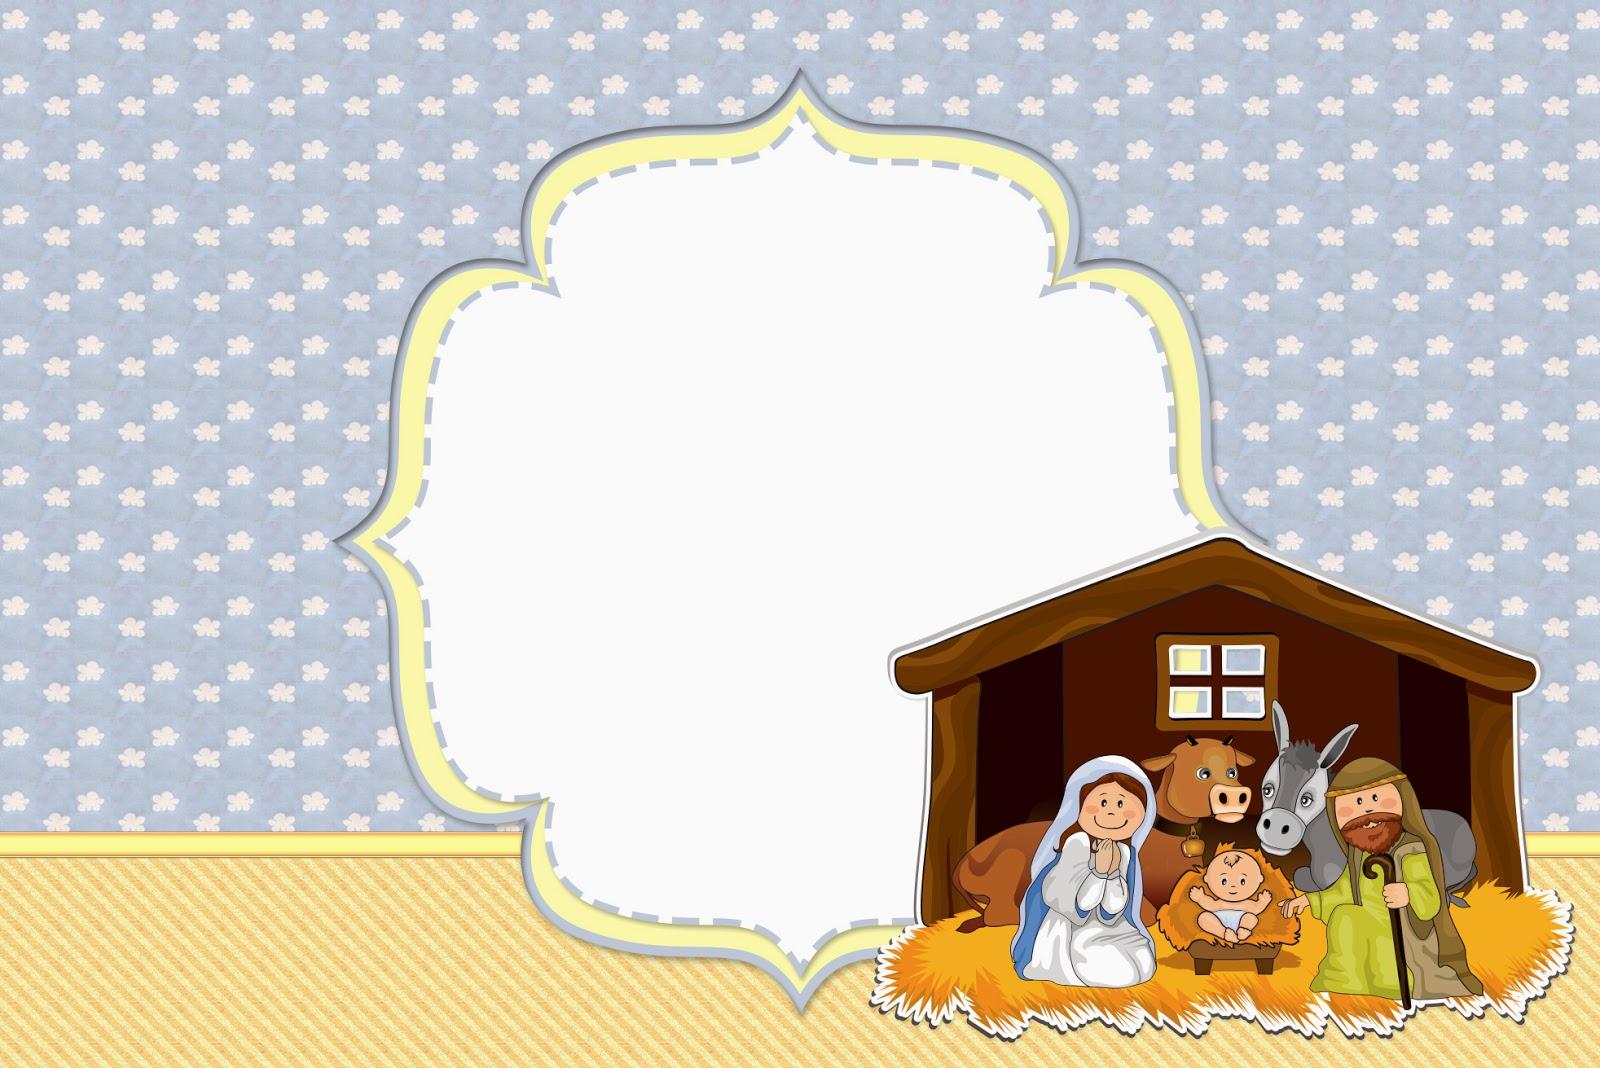 Sweet Nativity Scene: Free Party Printables.